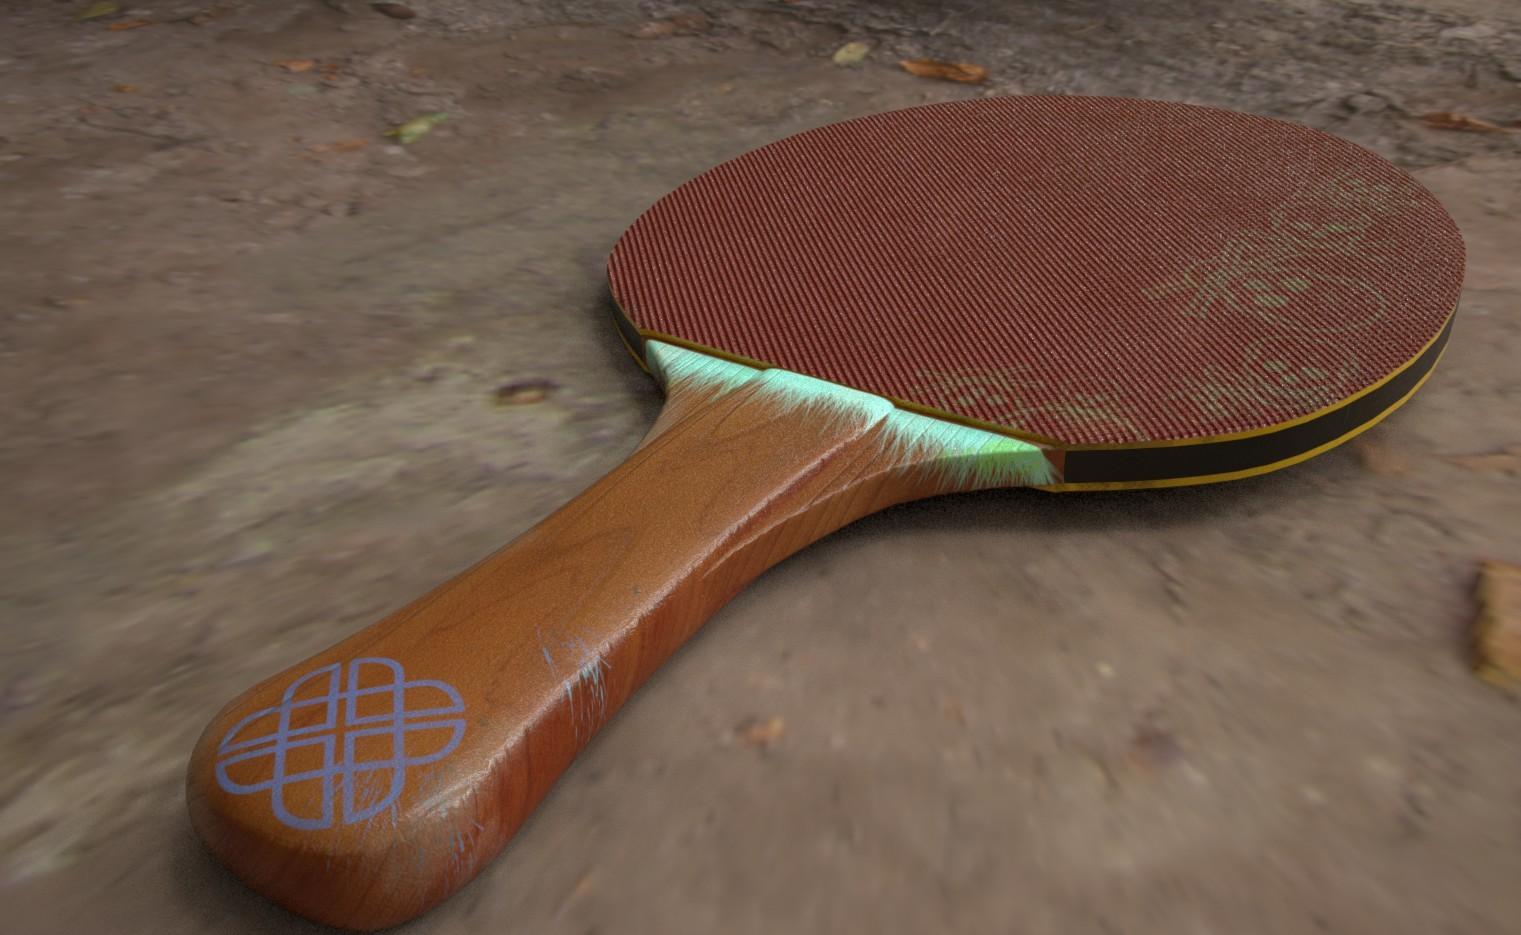 Carl vazquez pingpong3